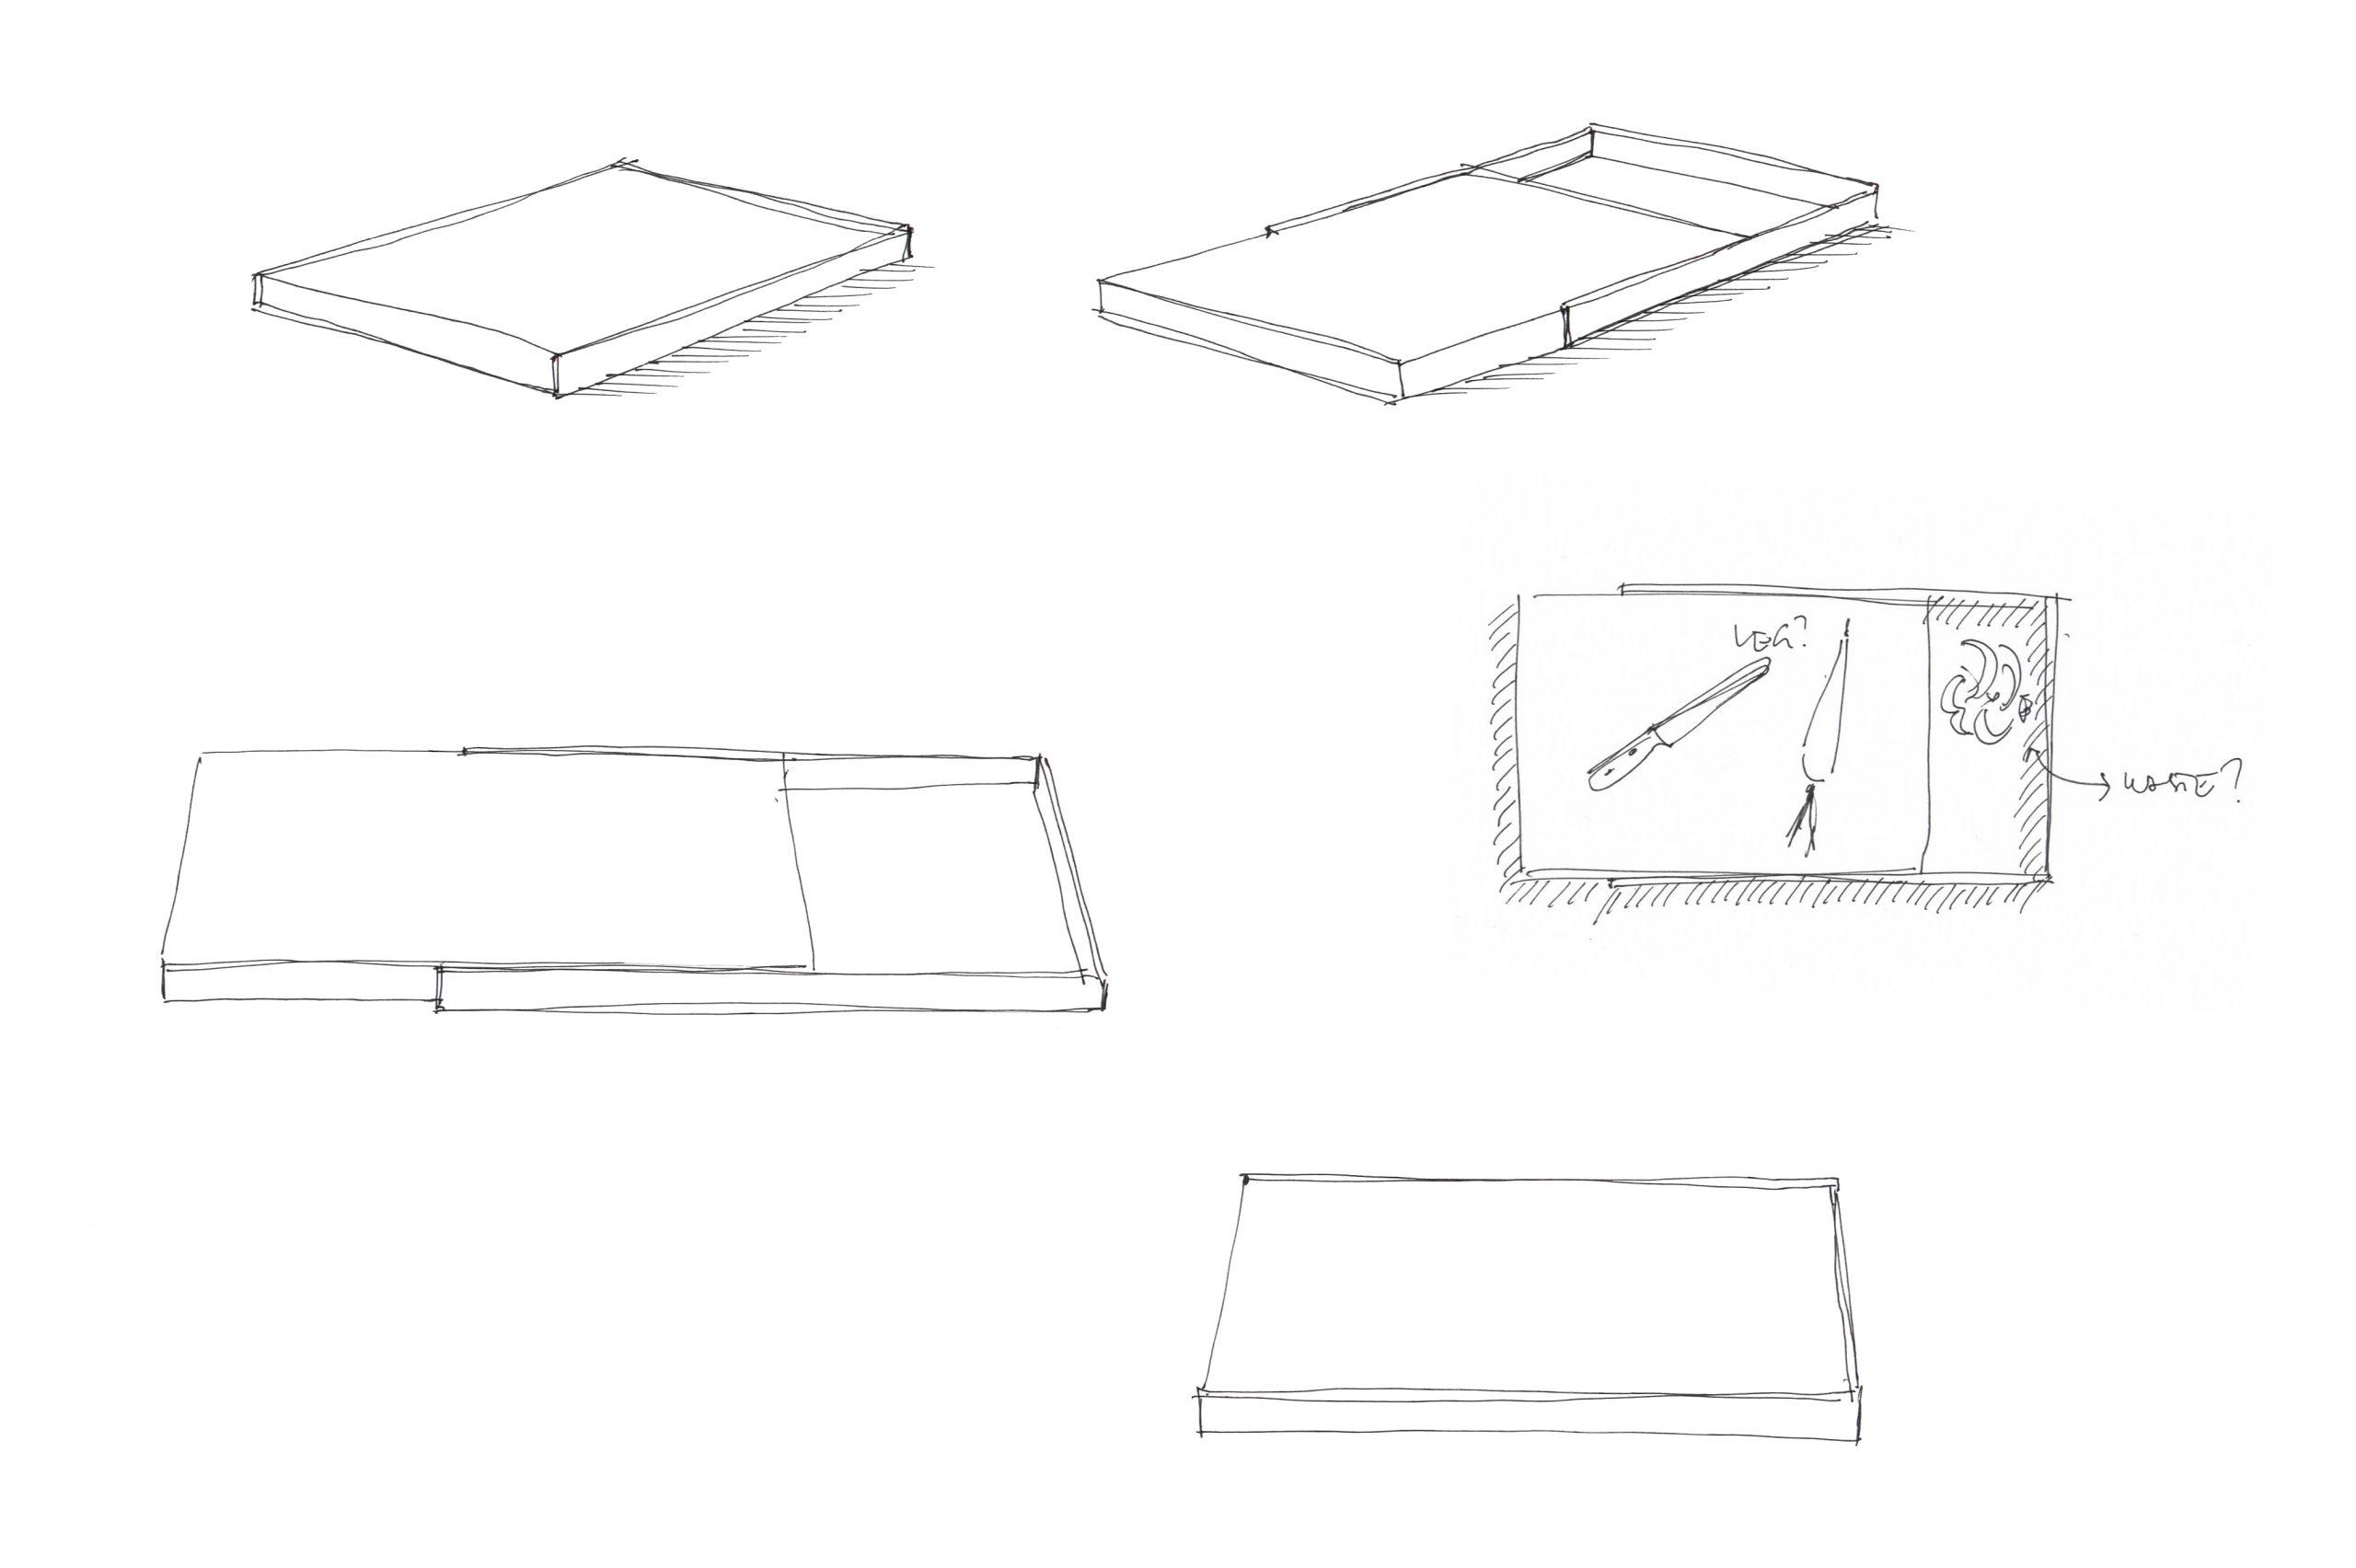 Sketch of the Frame cutting board designed by Debiasi Sandri for RigTig